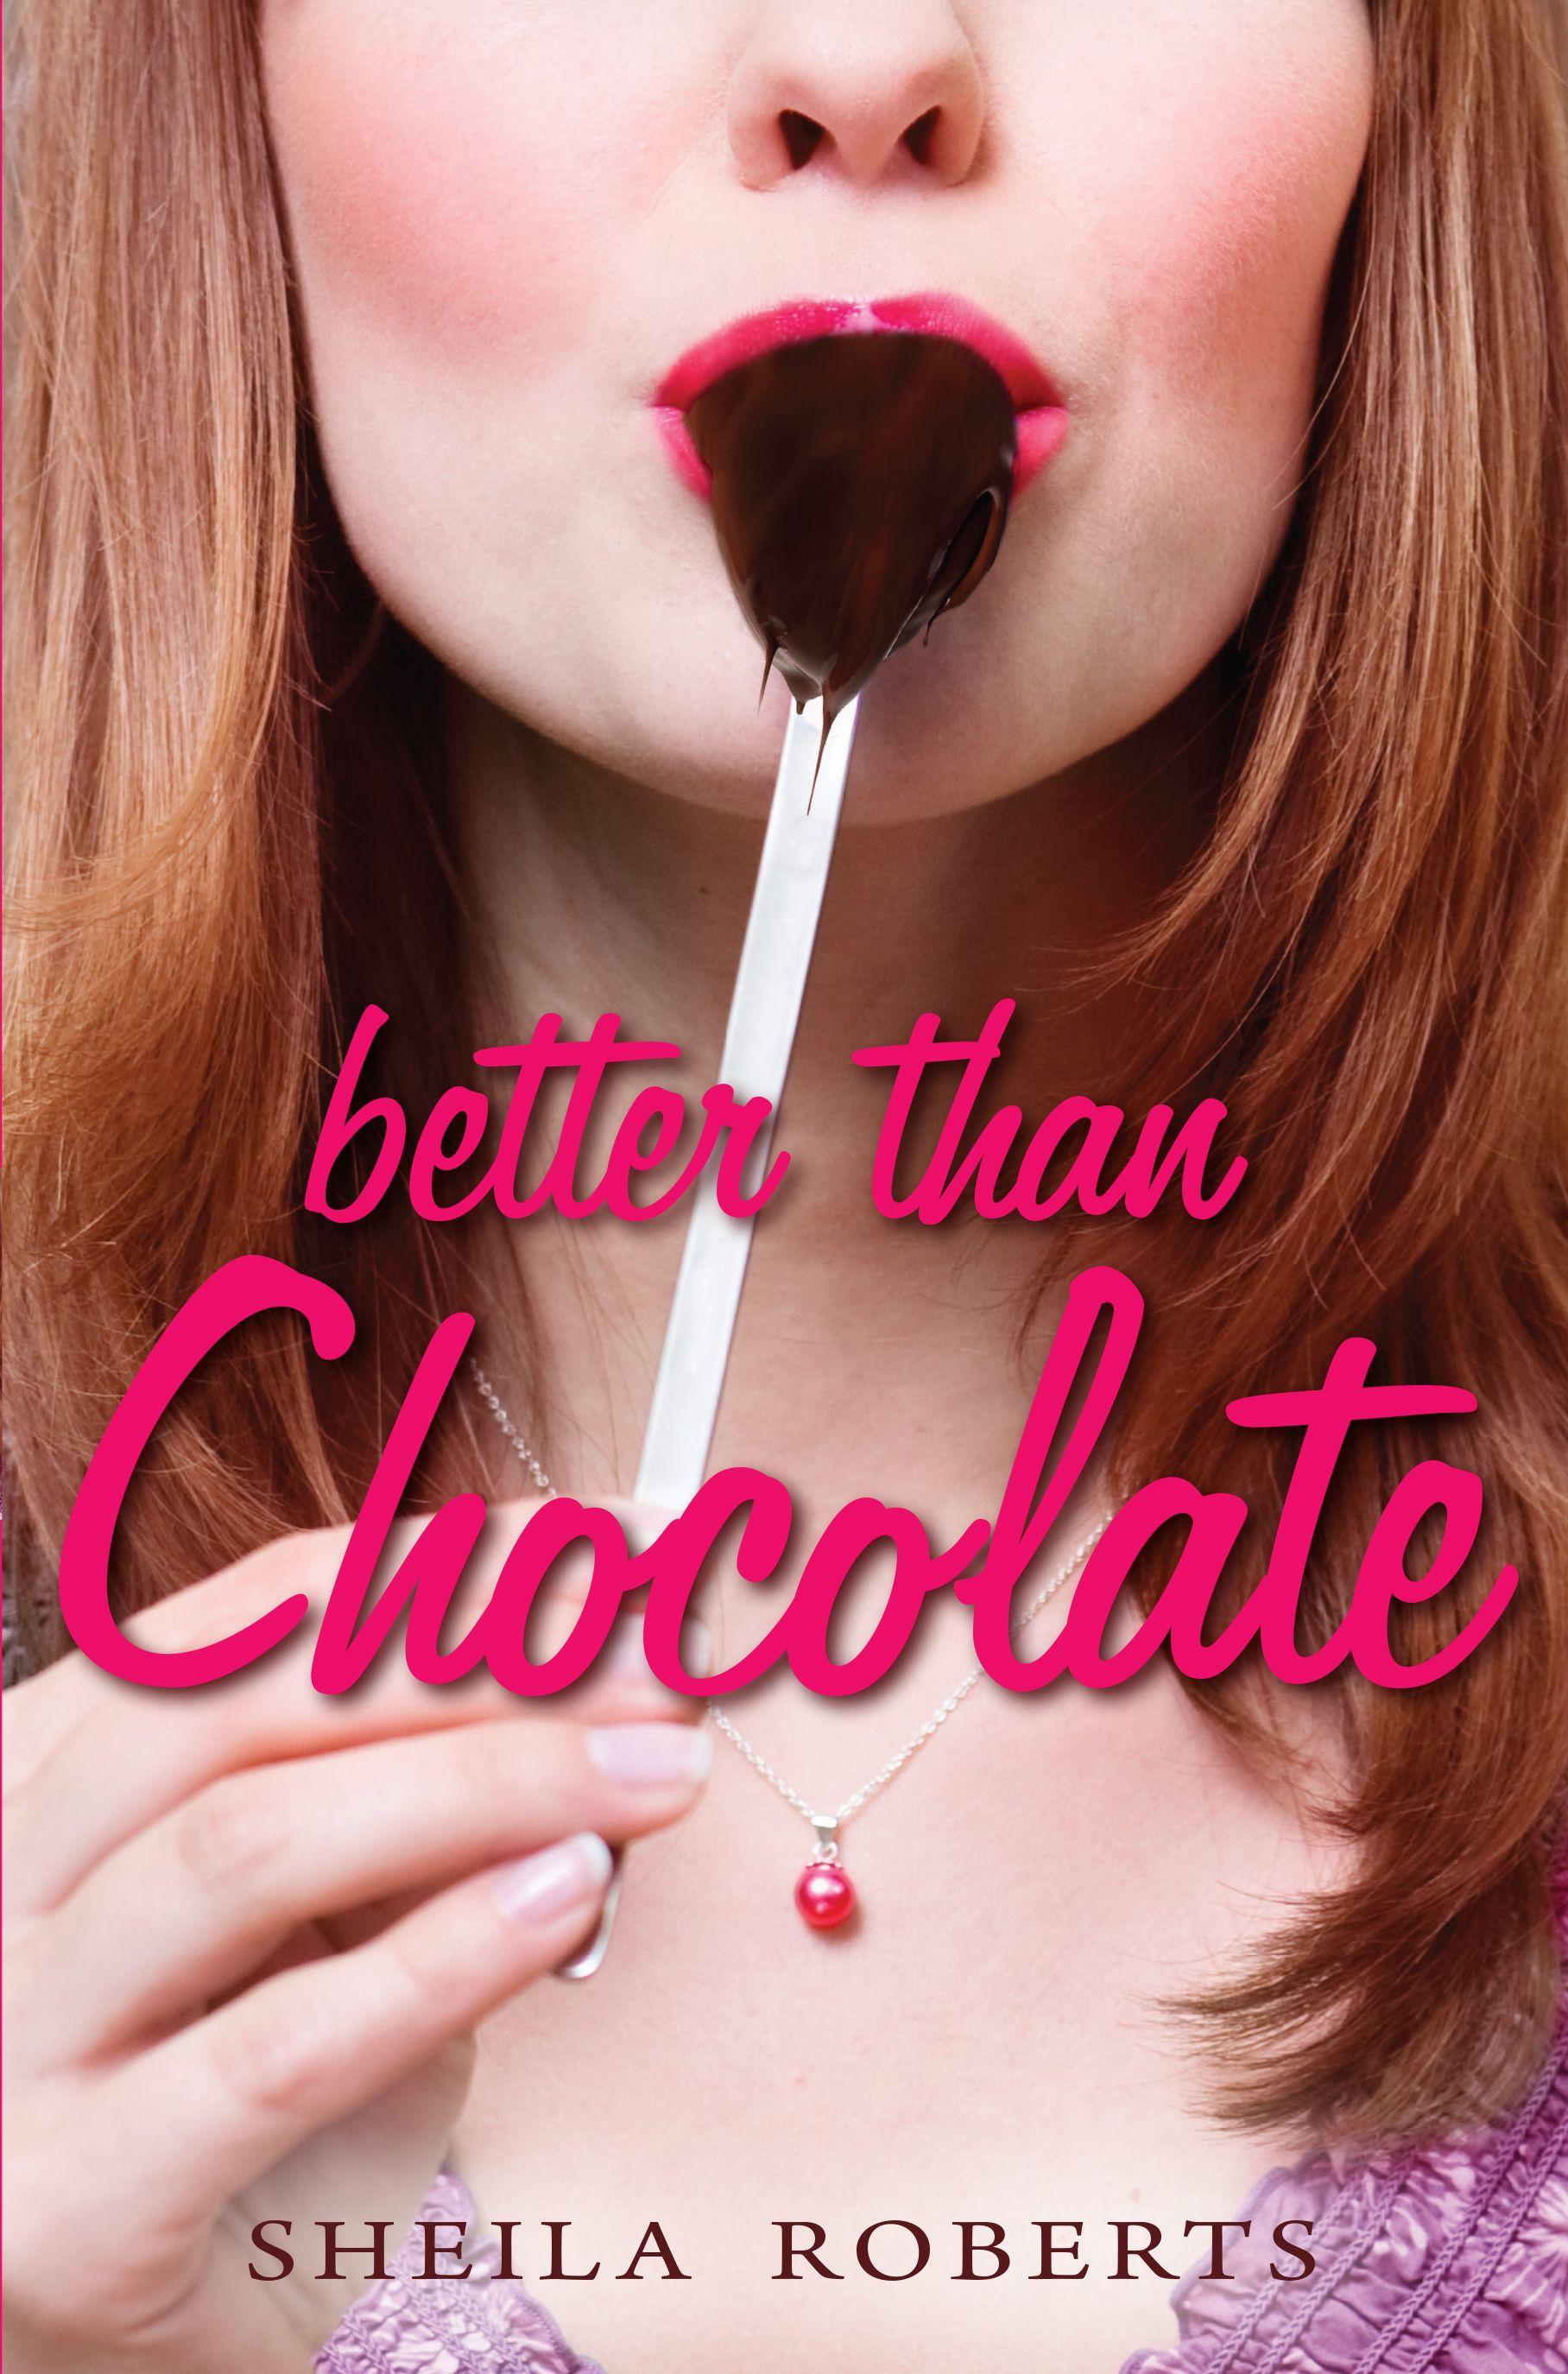 Better than Chocolate - Sheila Roberts.